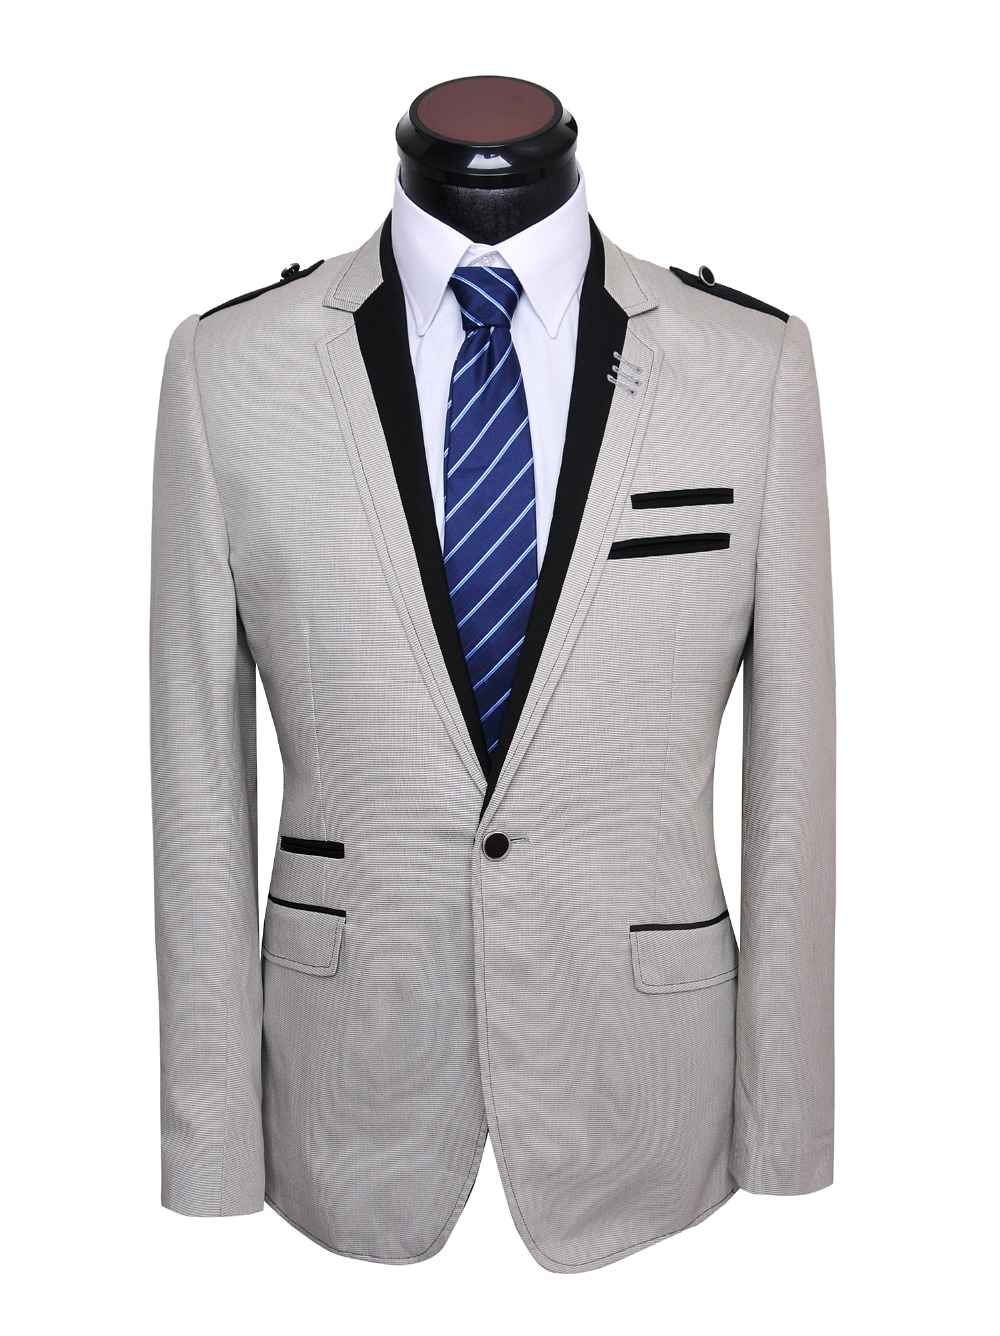 Online Get Cheap 2 Piece Suit for Men -Aliexpress.com | Alibaba Group